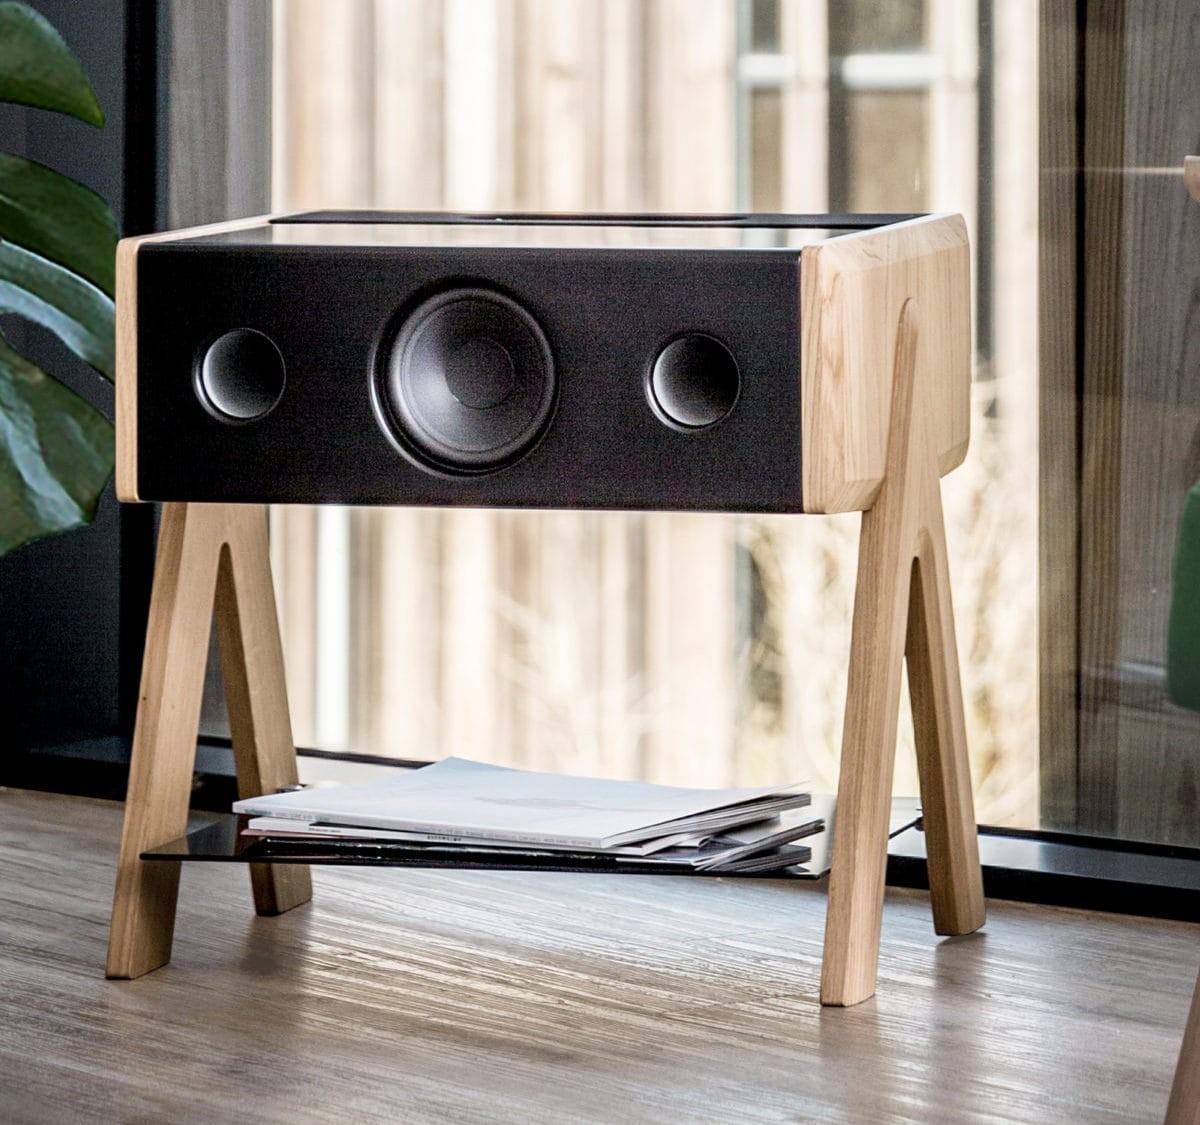 La Boite CUBE immersive loudspeaker also doubles as a coffee table thumbnail